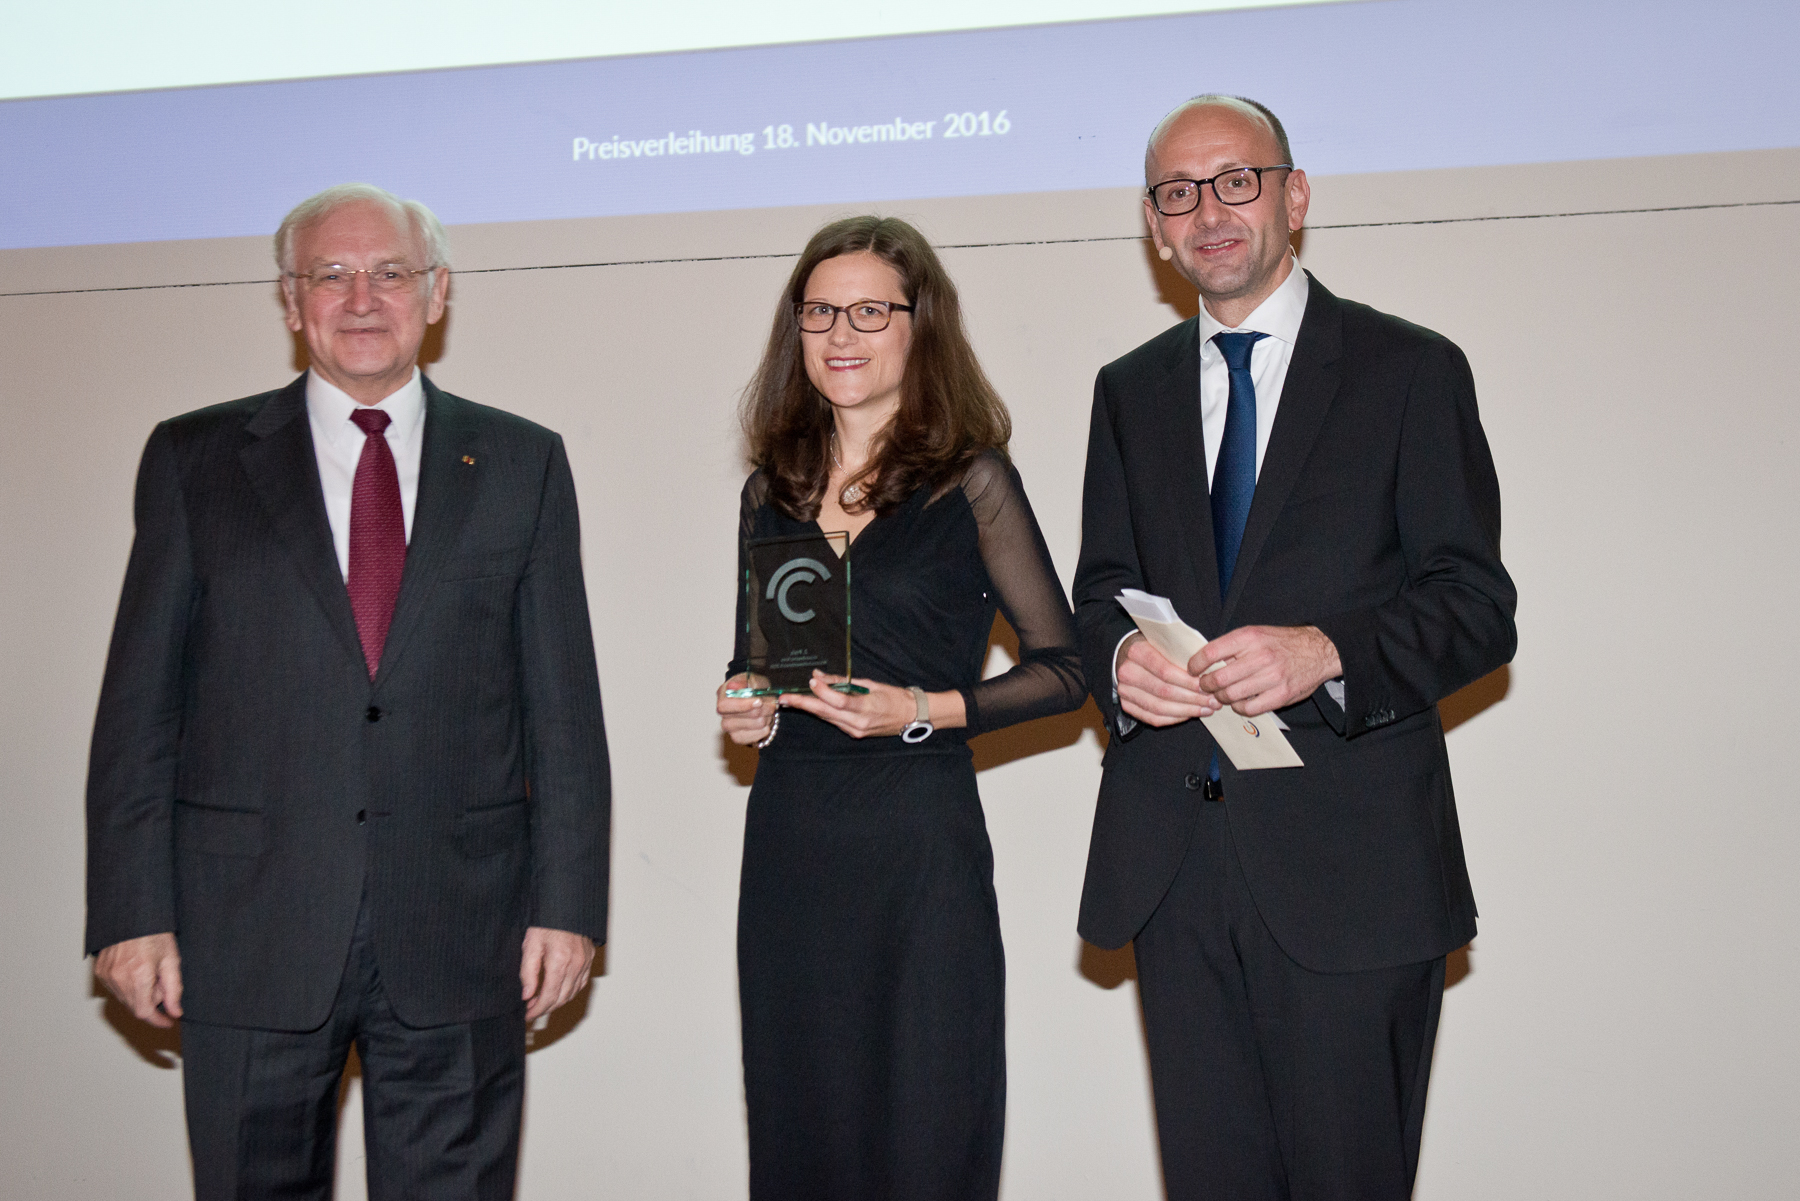 Prof. Siegfried Beck, Dr Andrea Braun (2nd prize), Prof. Lucas F. Flöther